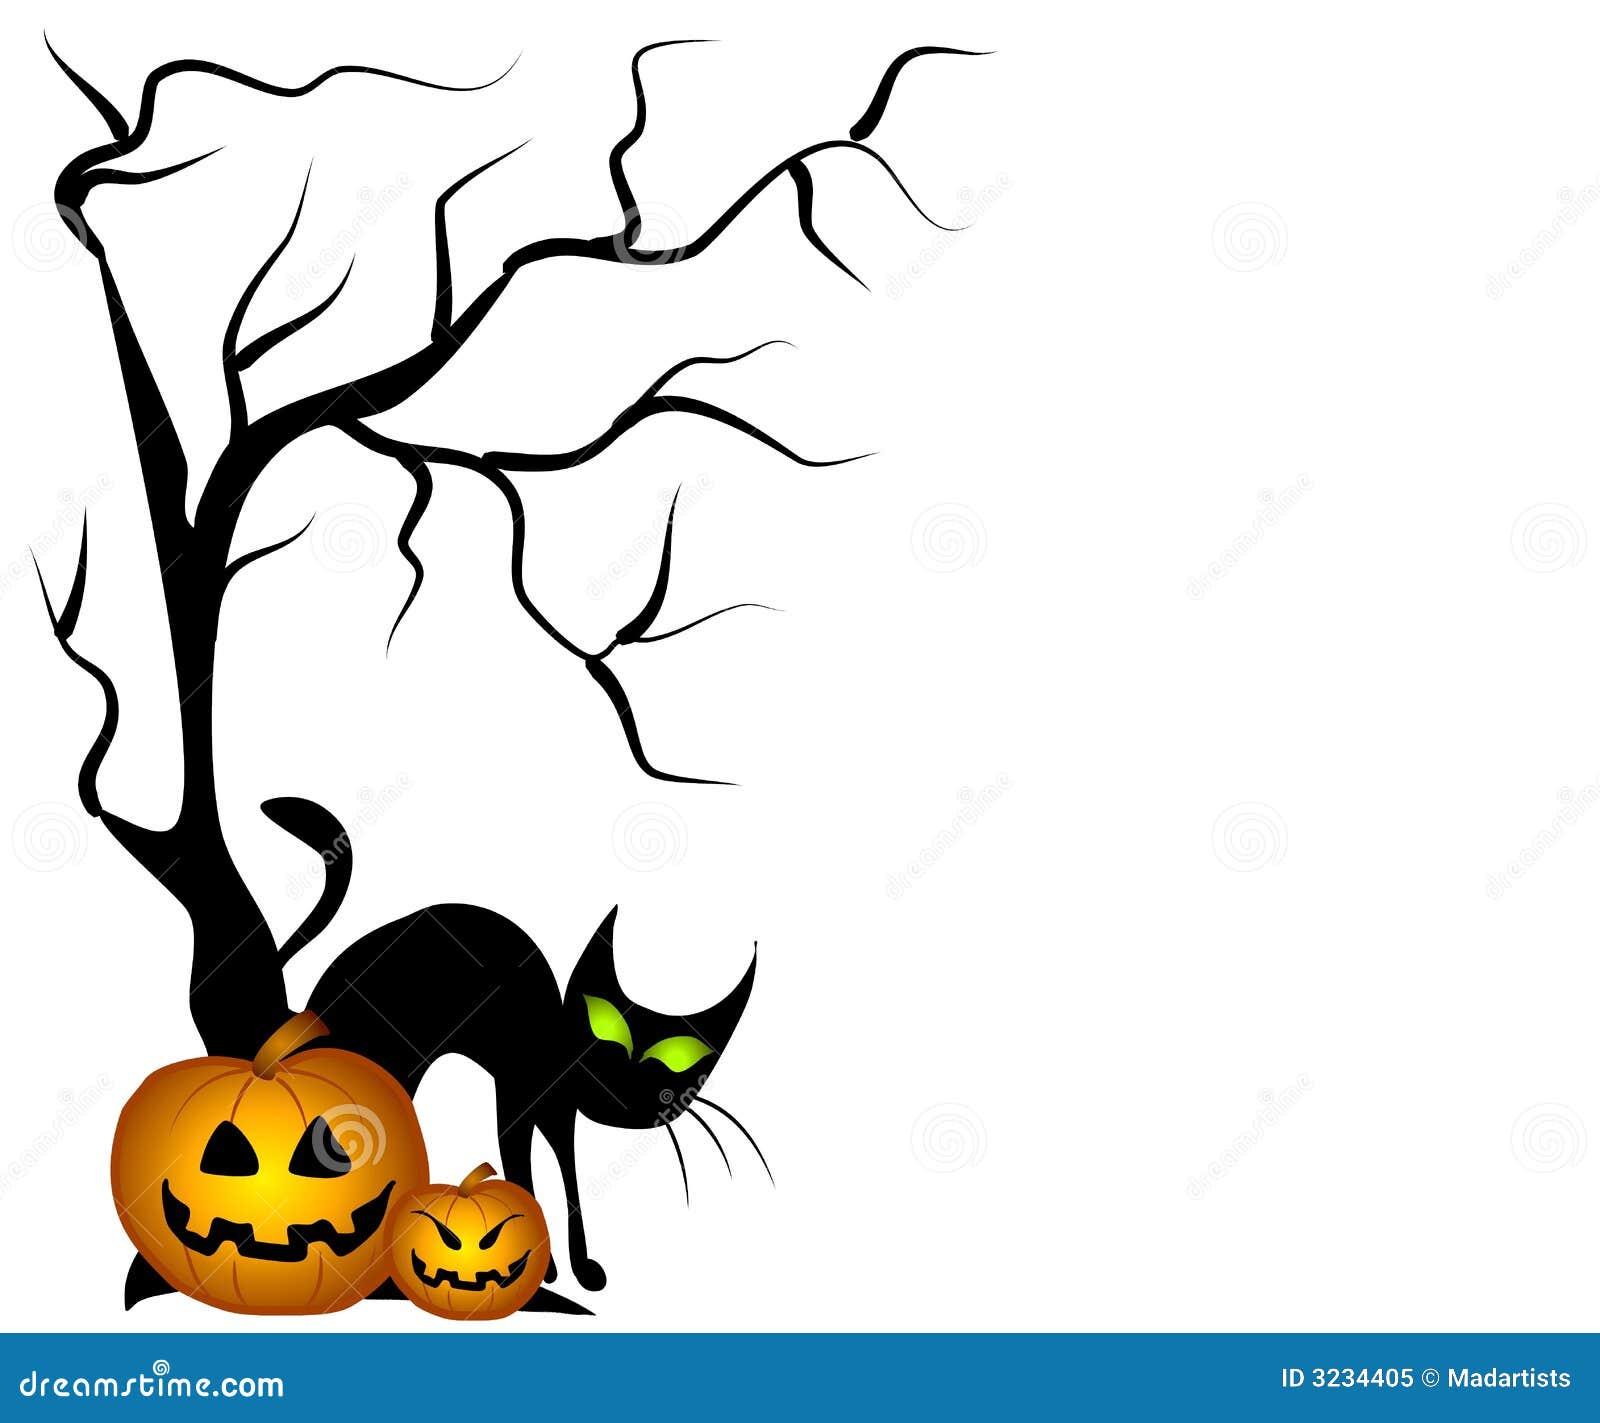 black cat halloween pumpkins royalty free stock photo image 3234405